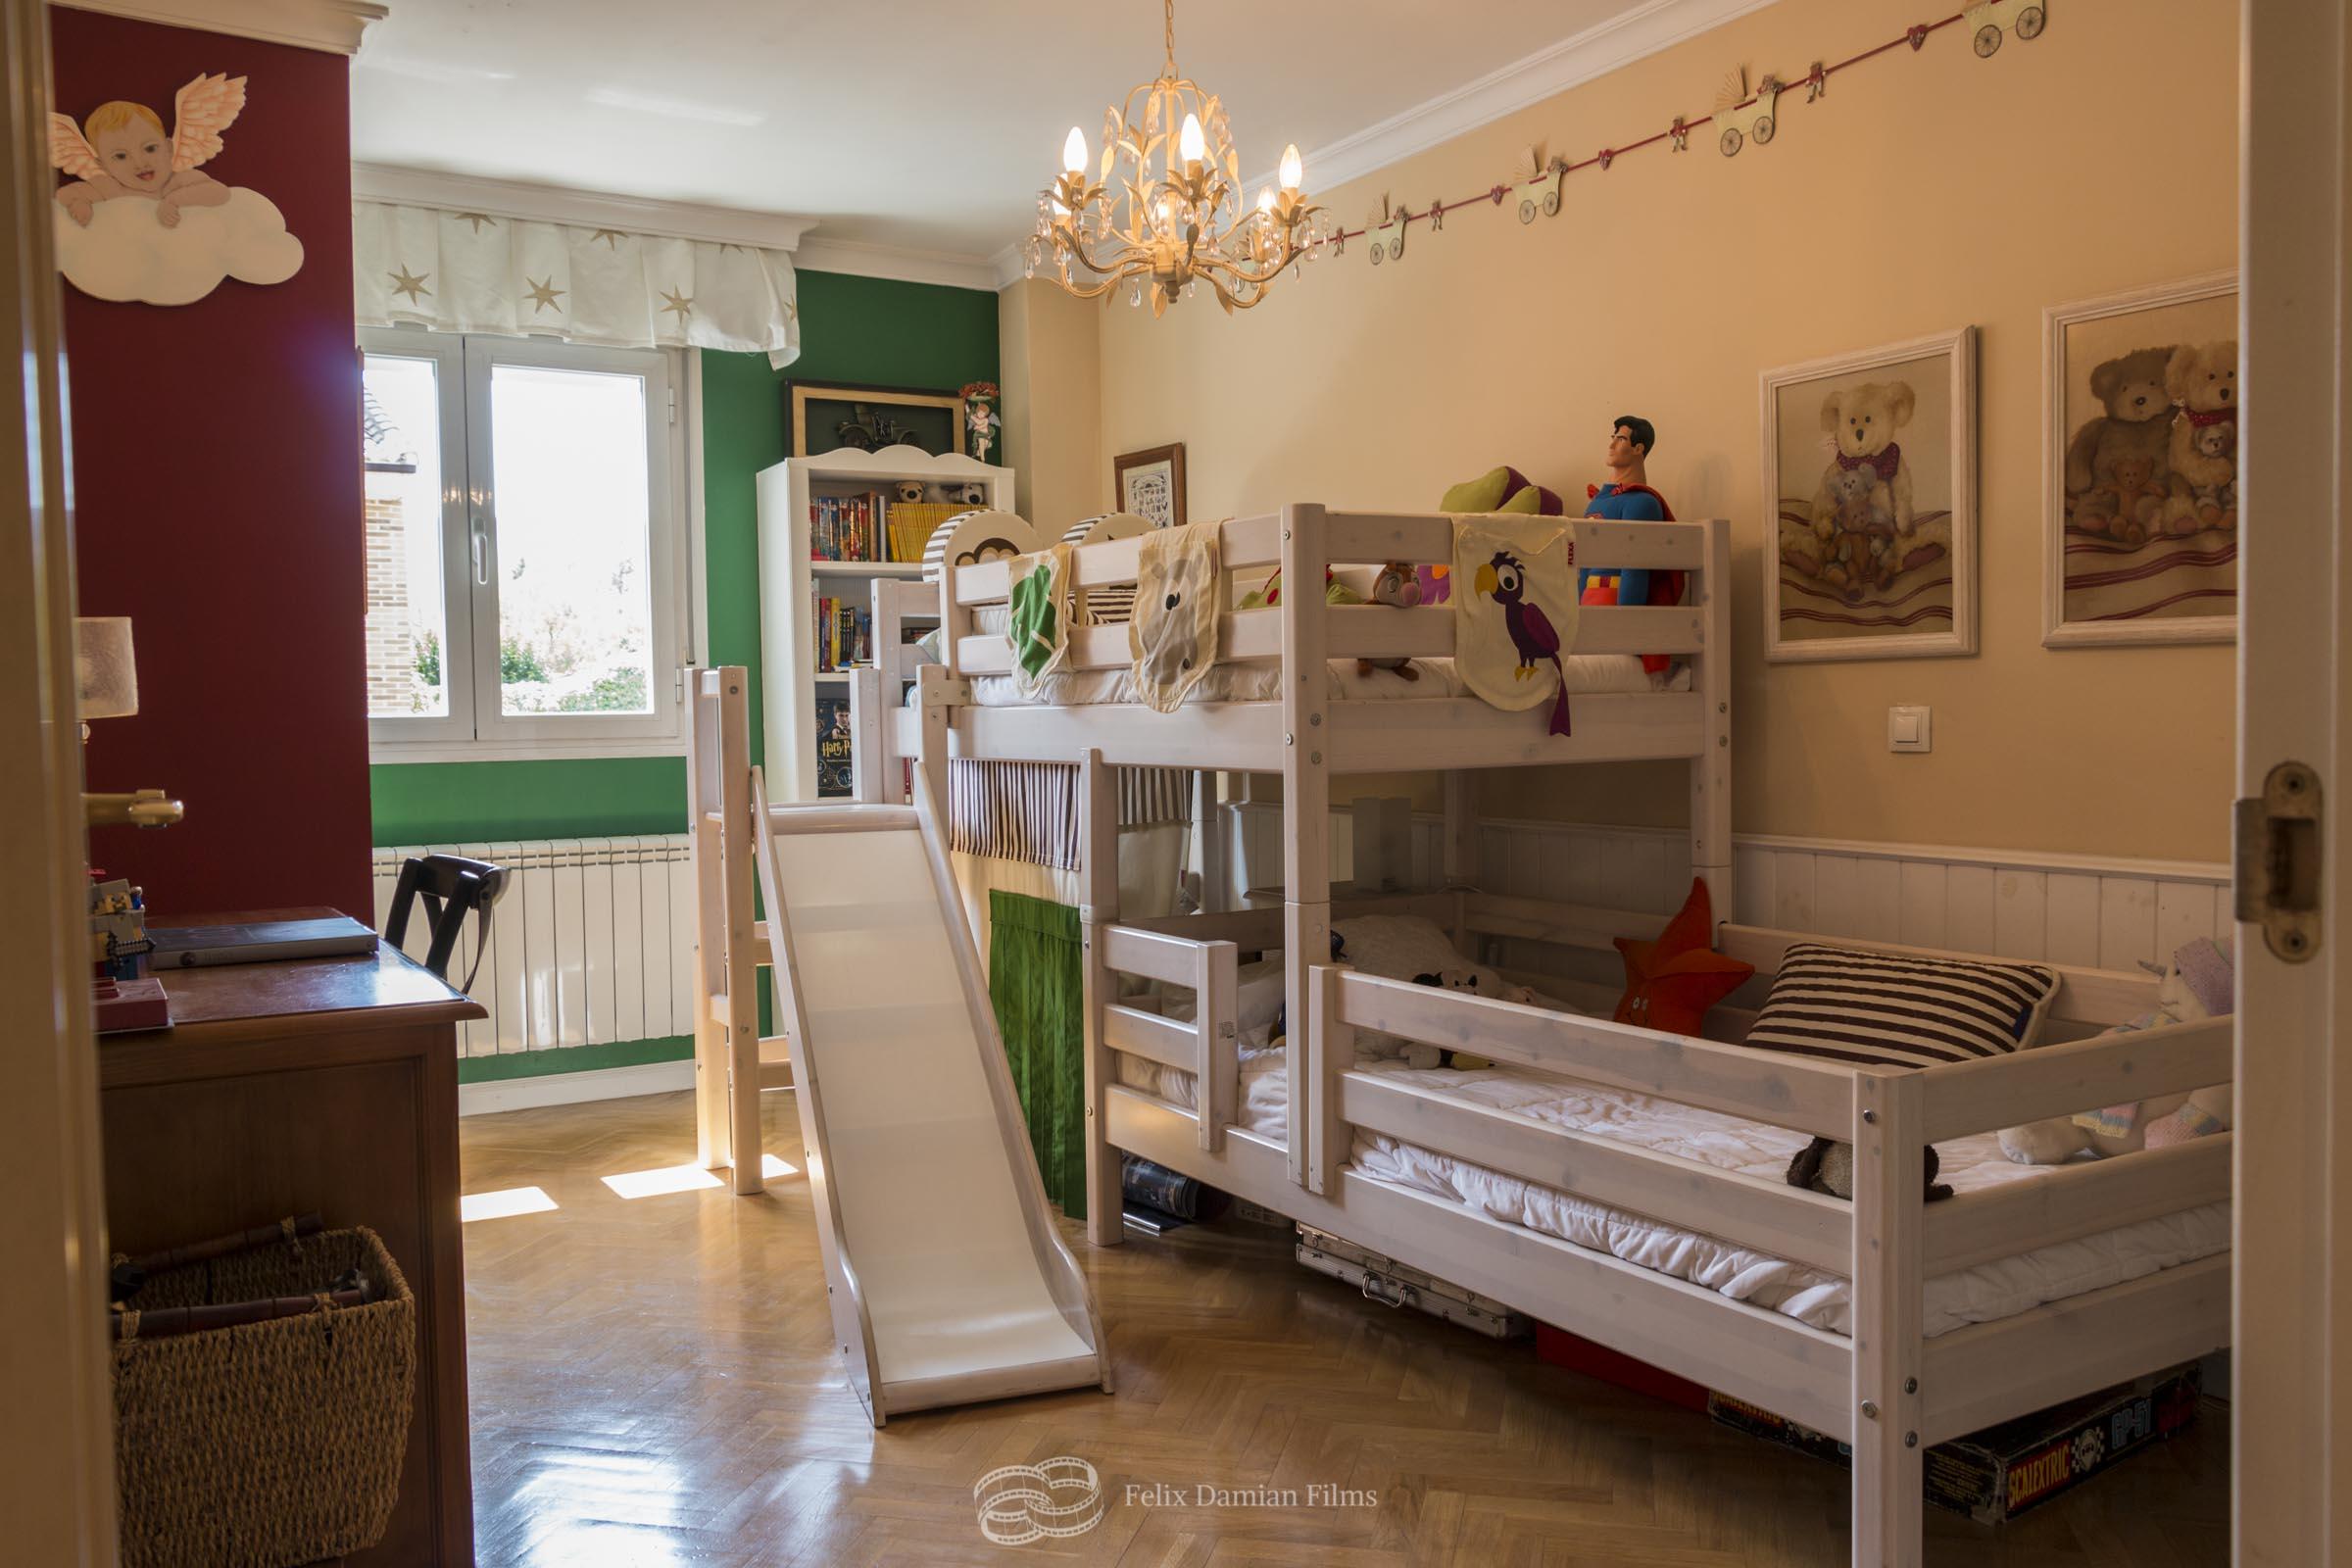 real estate fotografo de interiores madrid-2